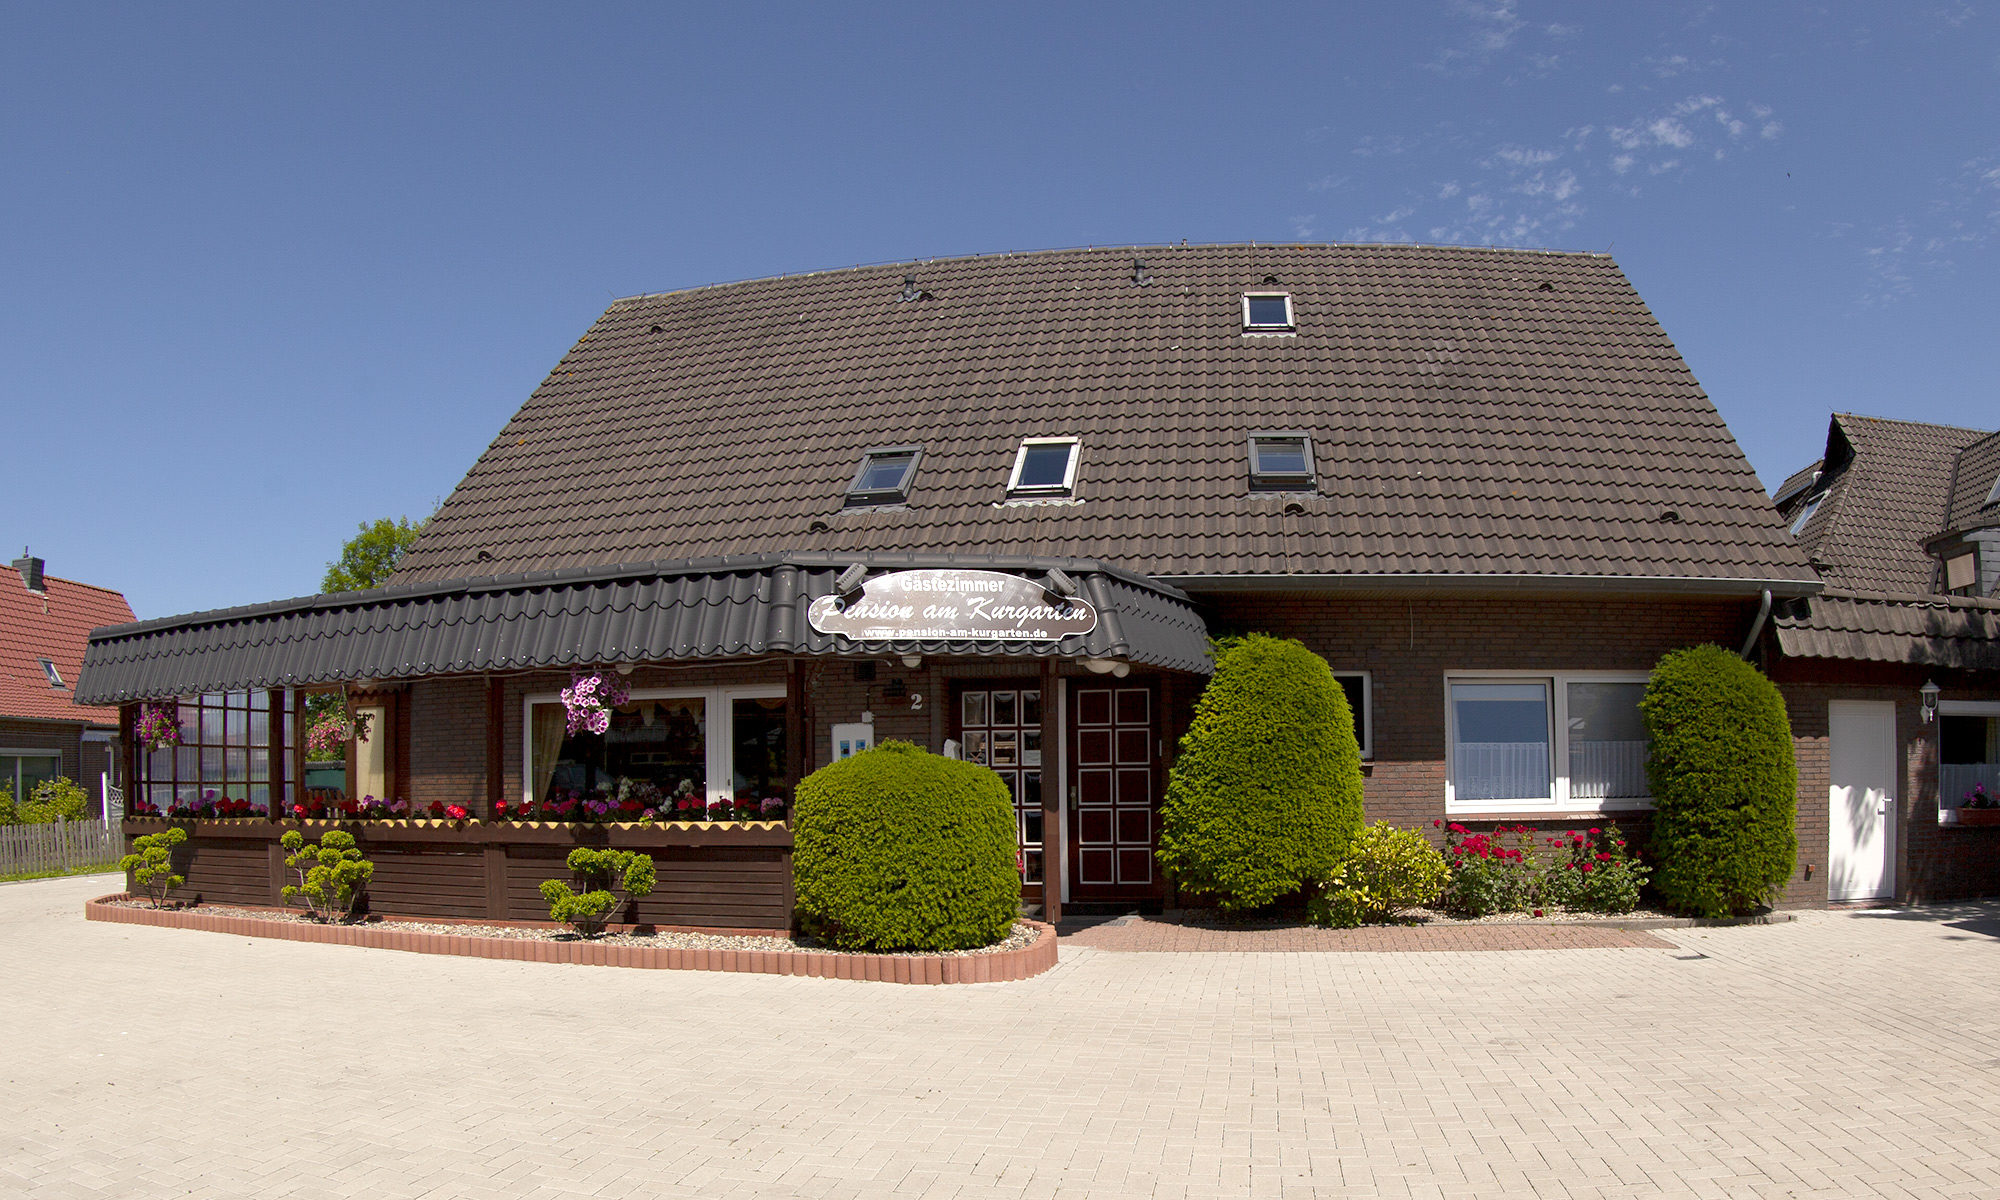 Hotel-Pension am Kurgarten